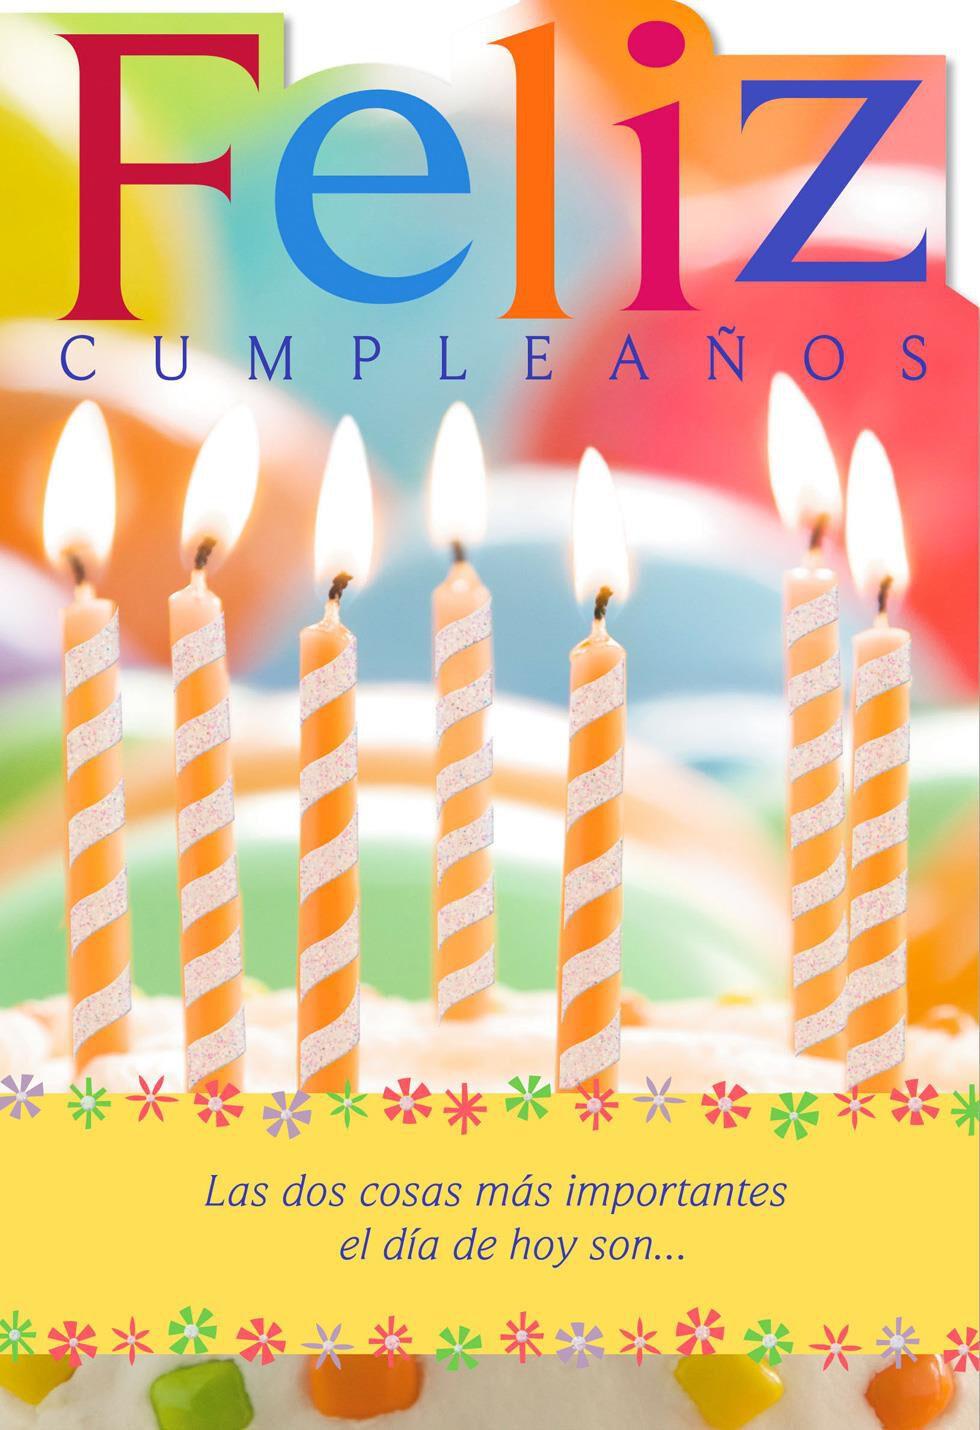 Candles SpanishLanguage Religious Birthday Card Greeting Cards